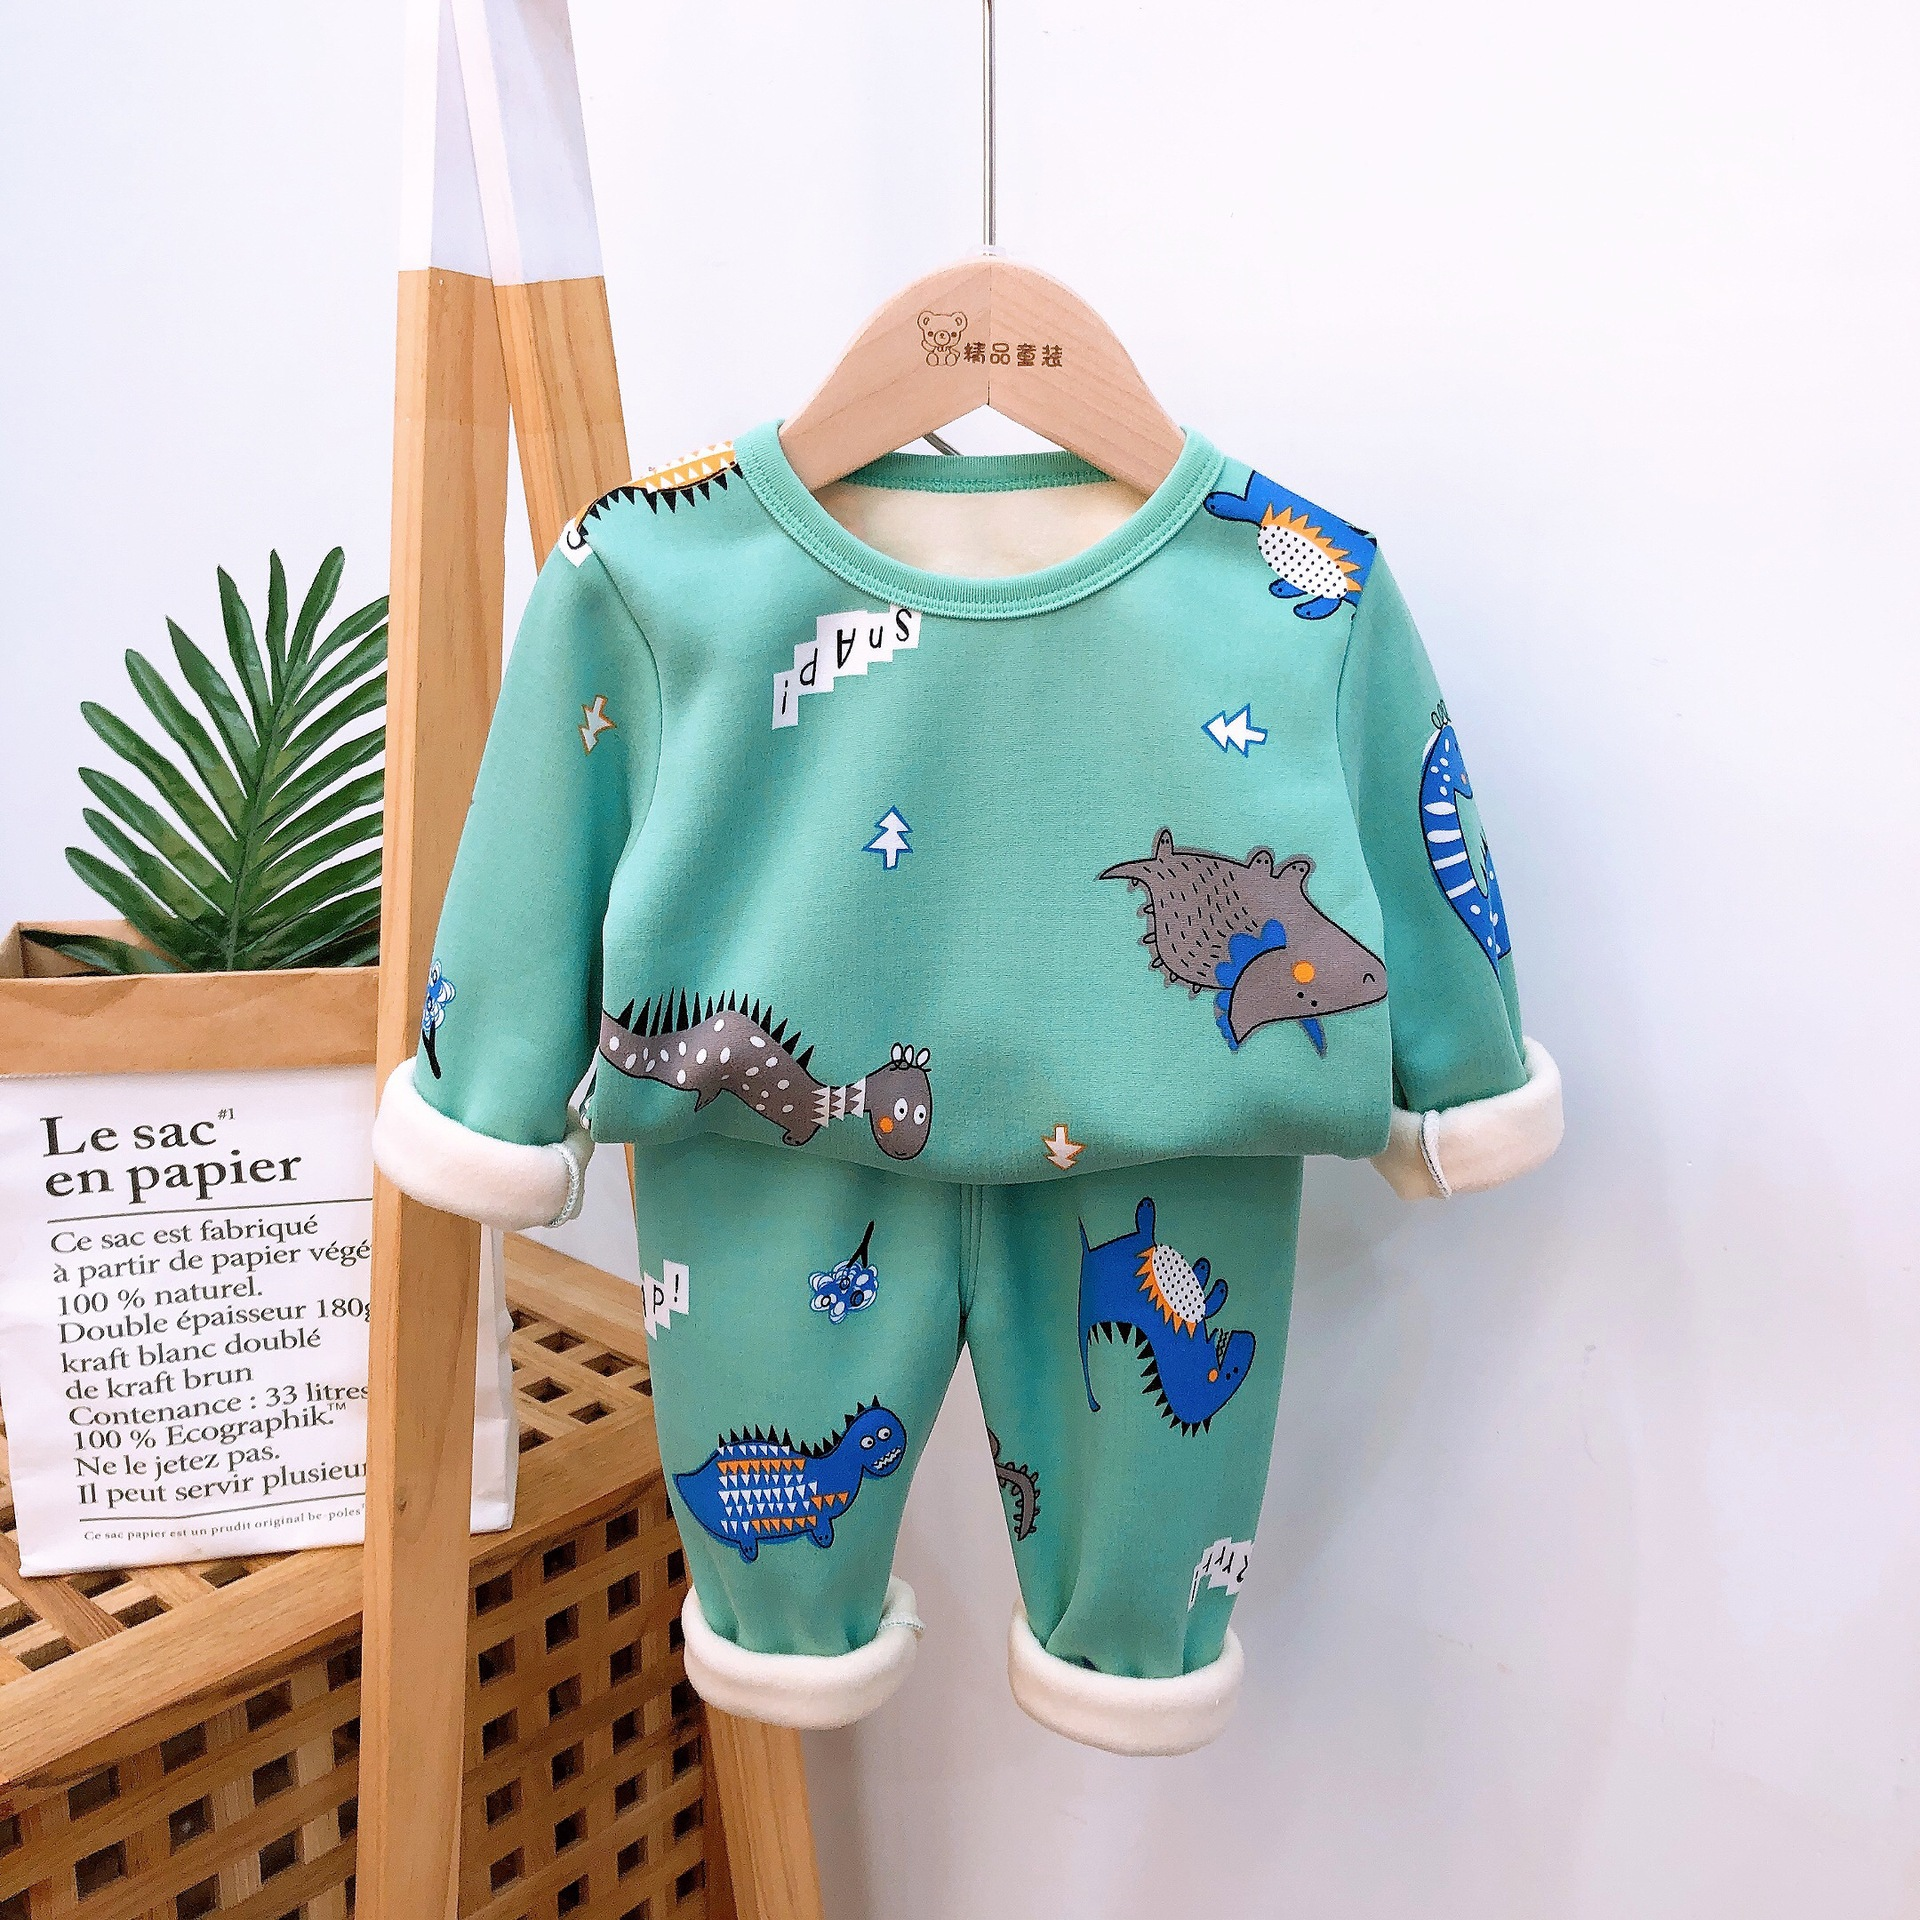 2020 Autumn Winter Thicken Velvet Children Pajamas Cartoon Family Boys Girls Clothing Set Kids Casual Sleepwear Suits Clothes 3